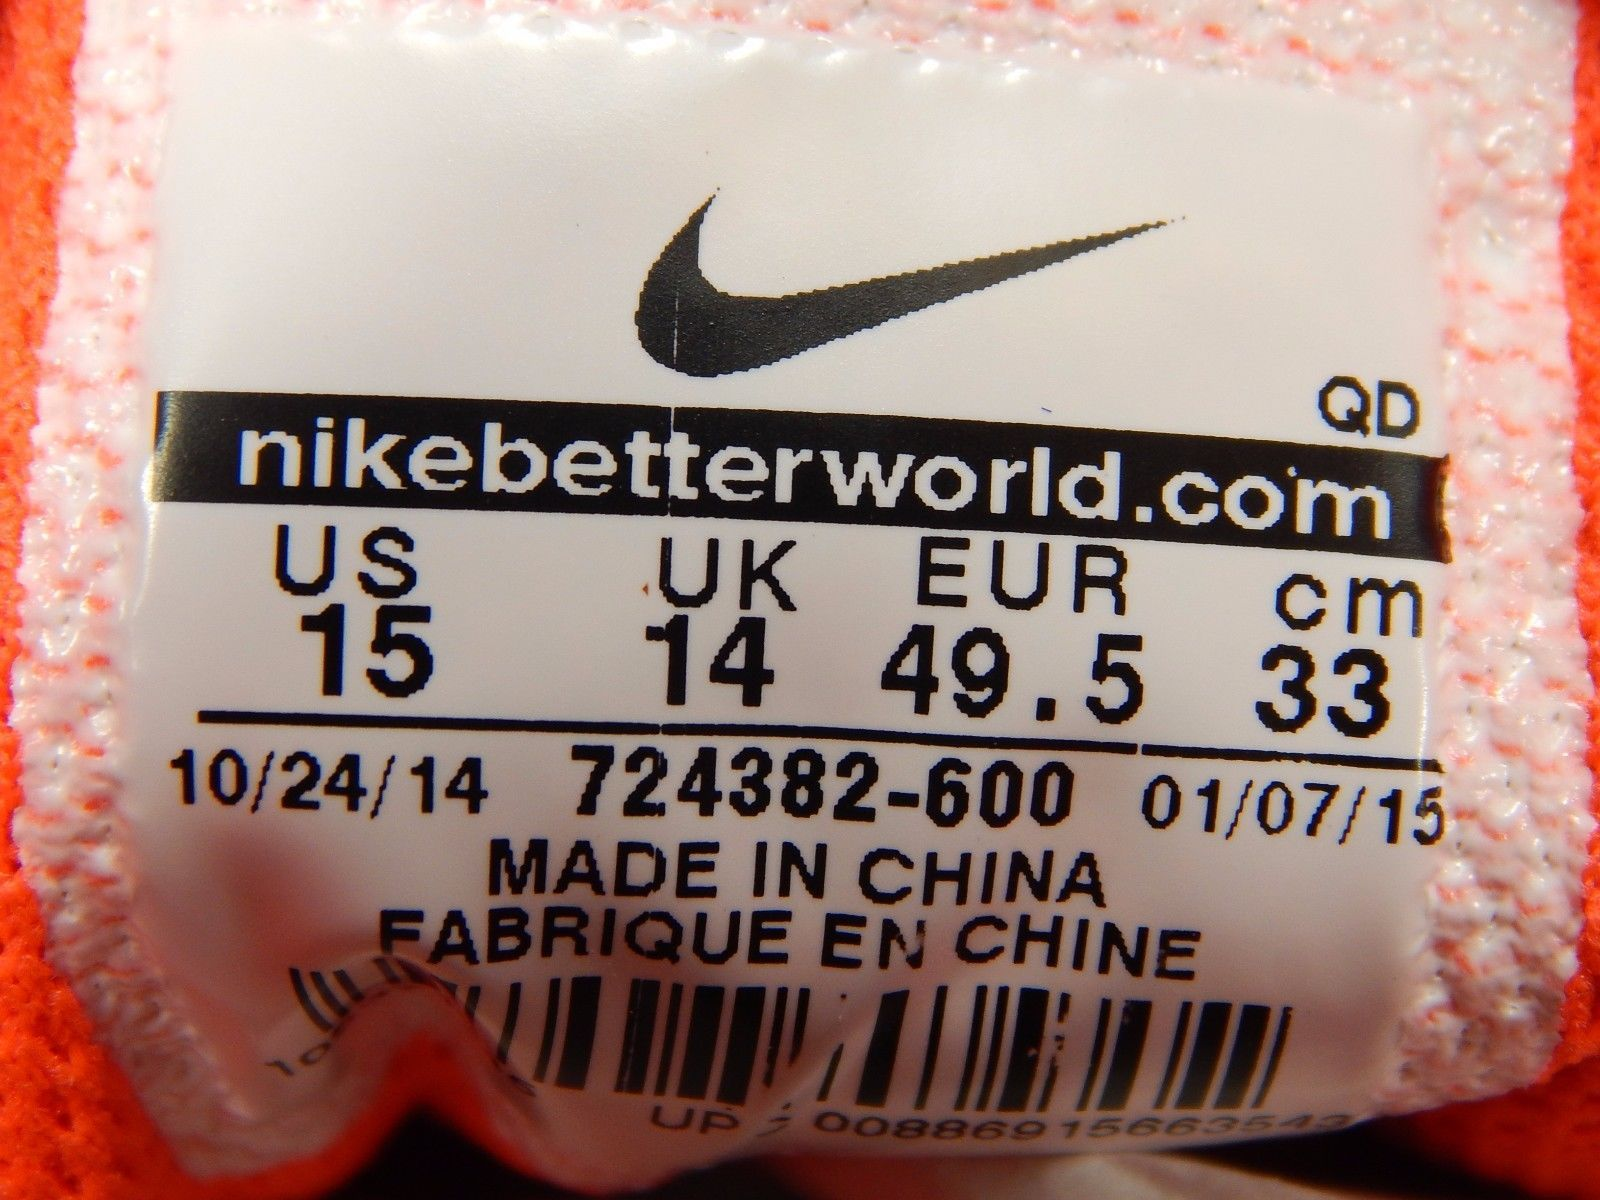 Nike Free 5.0 2015 Men's Running Shoes Size US 15 M (D) EU 49.5 Red 724382-600